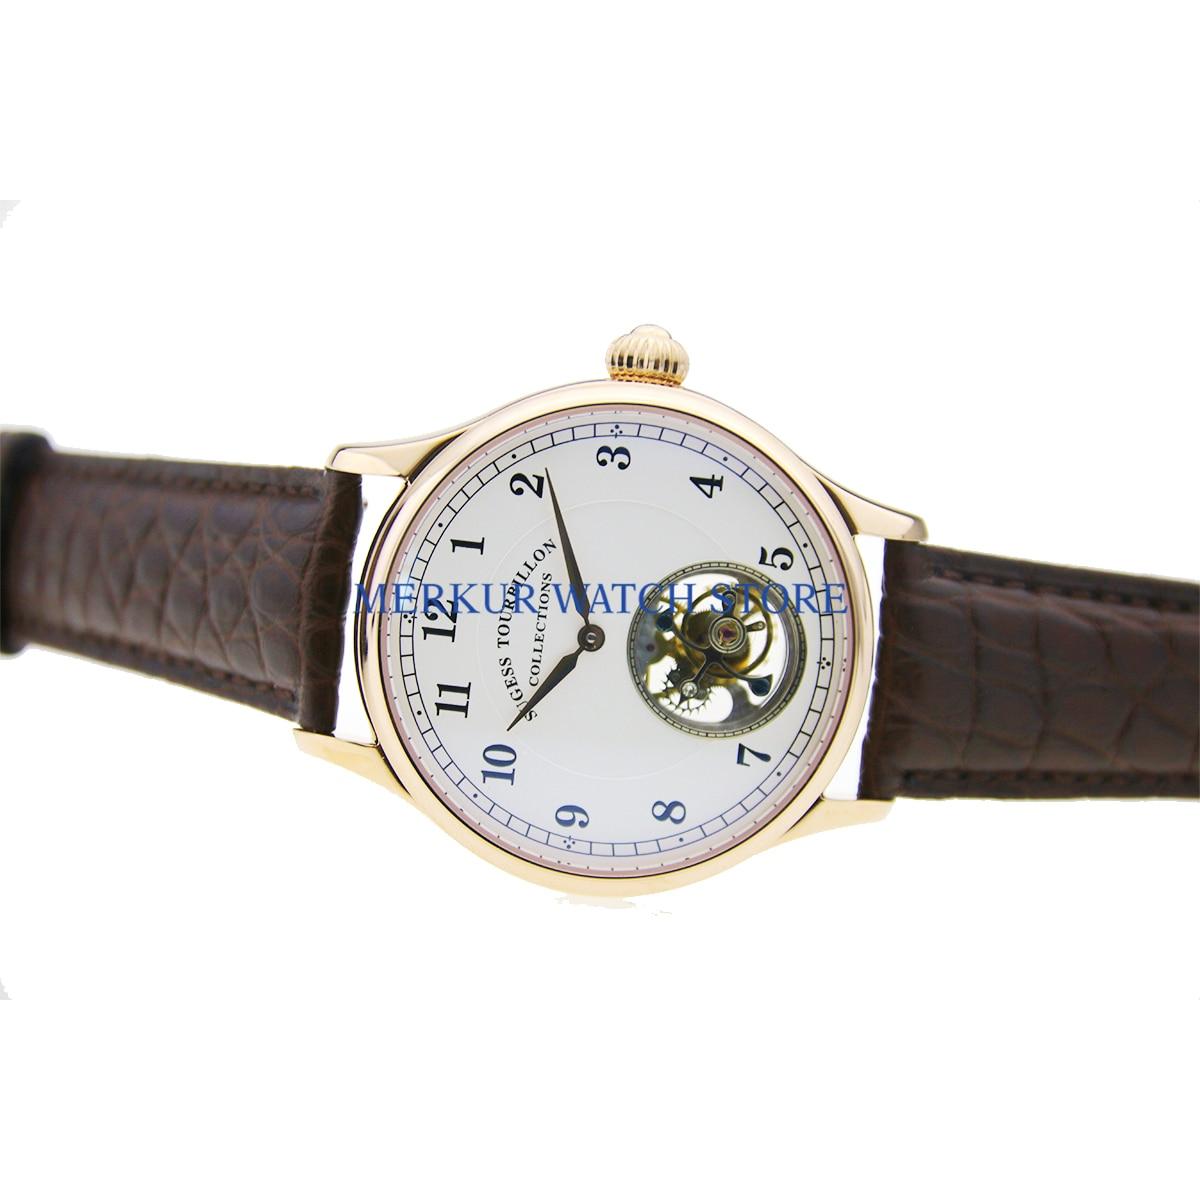 Sugess-ساعة ميكانيكية للرجال ، مطلية بالذهب ، مينا أبيض ، حركة توربيون ، هيكل عظمي ، مينا